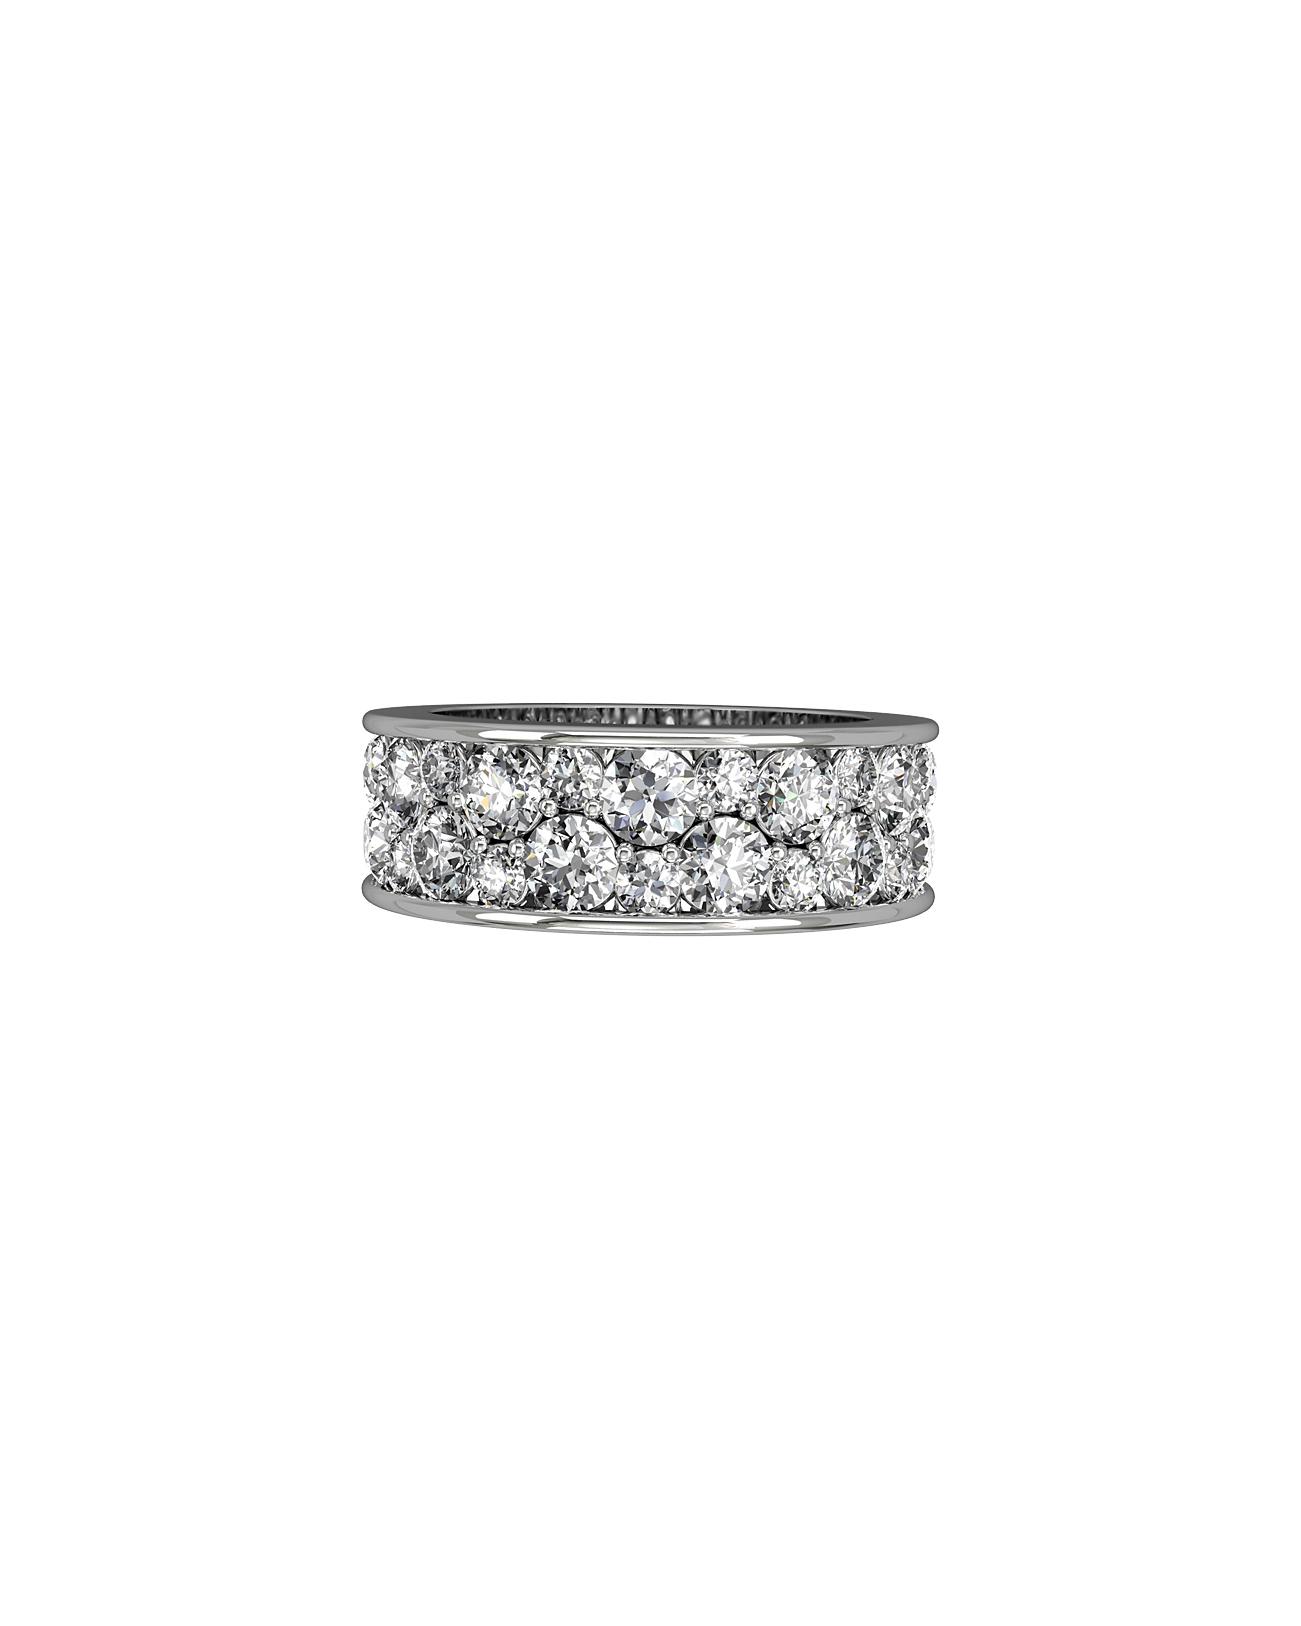 designer diamond bridal jewelry-1-6.jpg